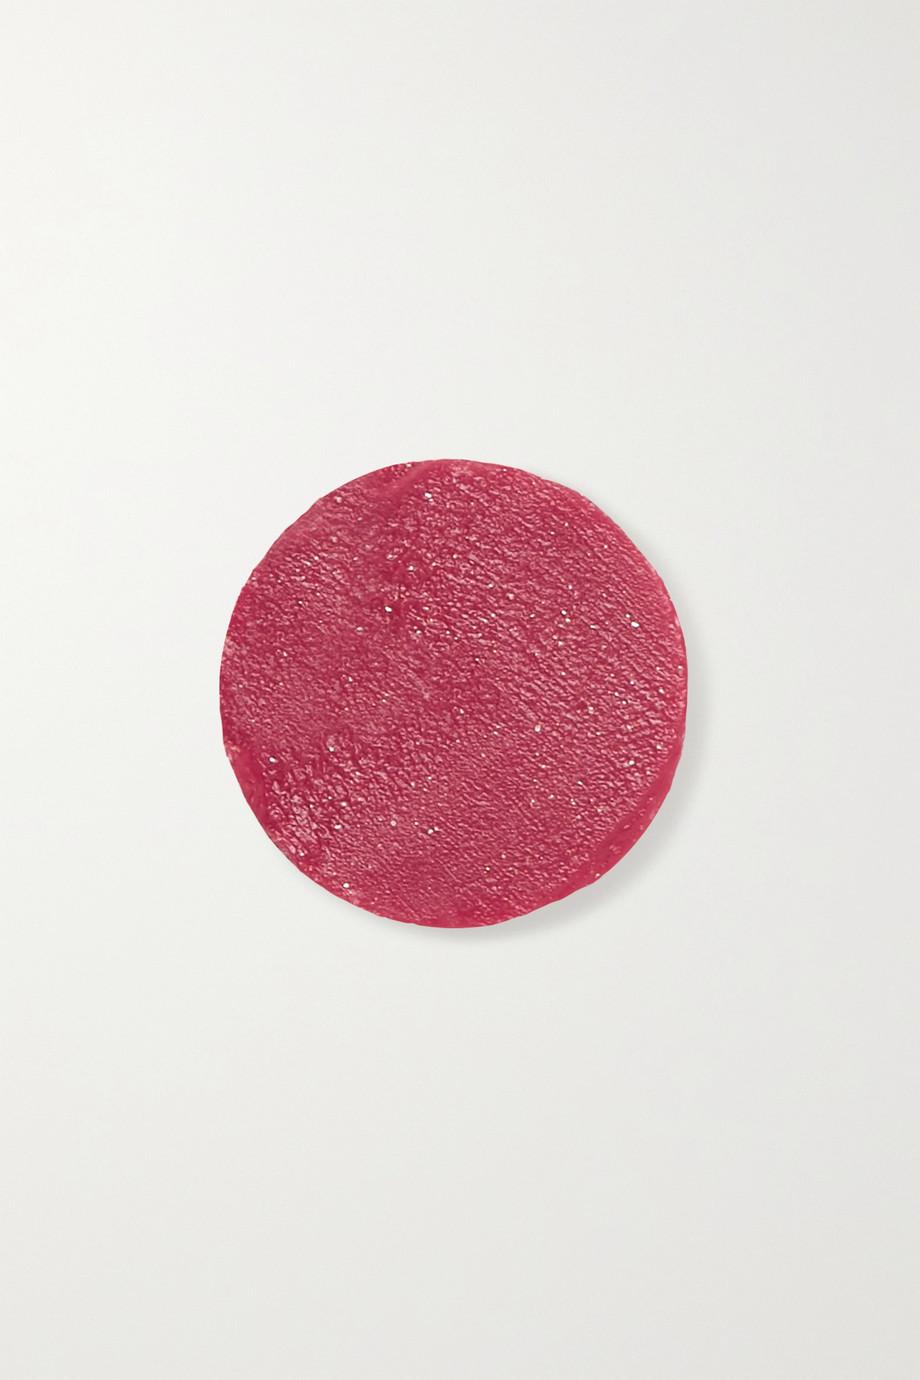 Chantecaille Lip Tint Hydrating Balm - Verbena